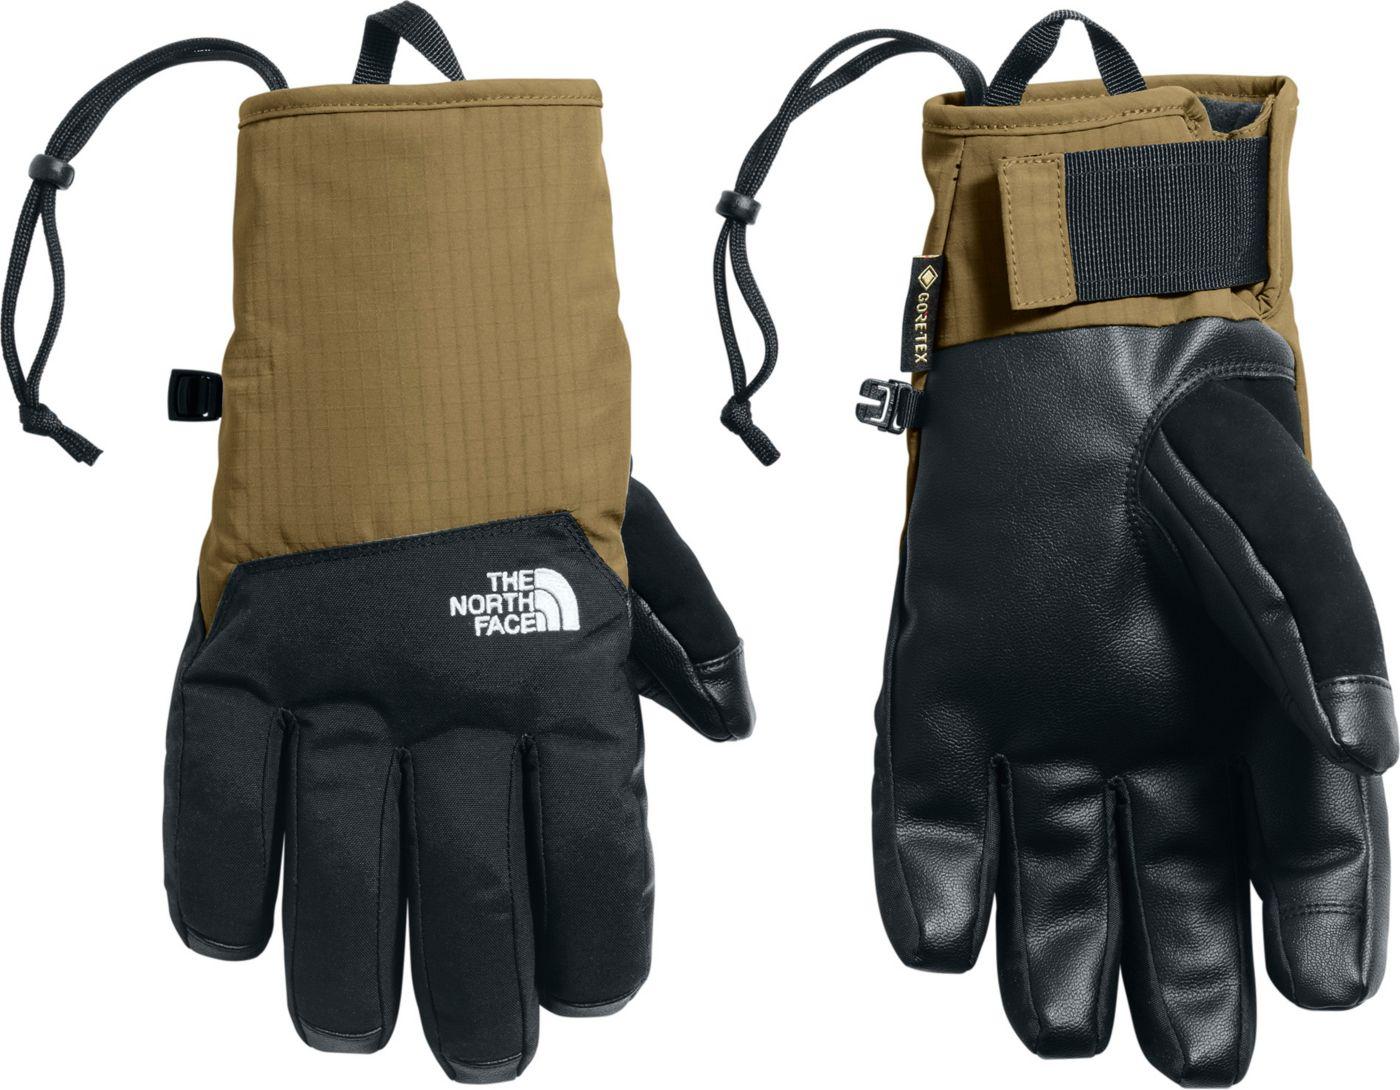 The North Face Men's Workwear Etip Gloves